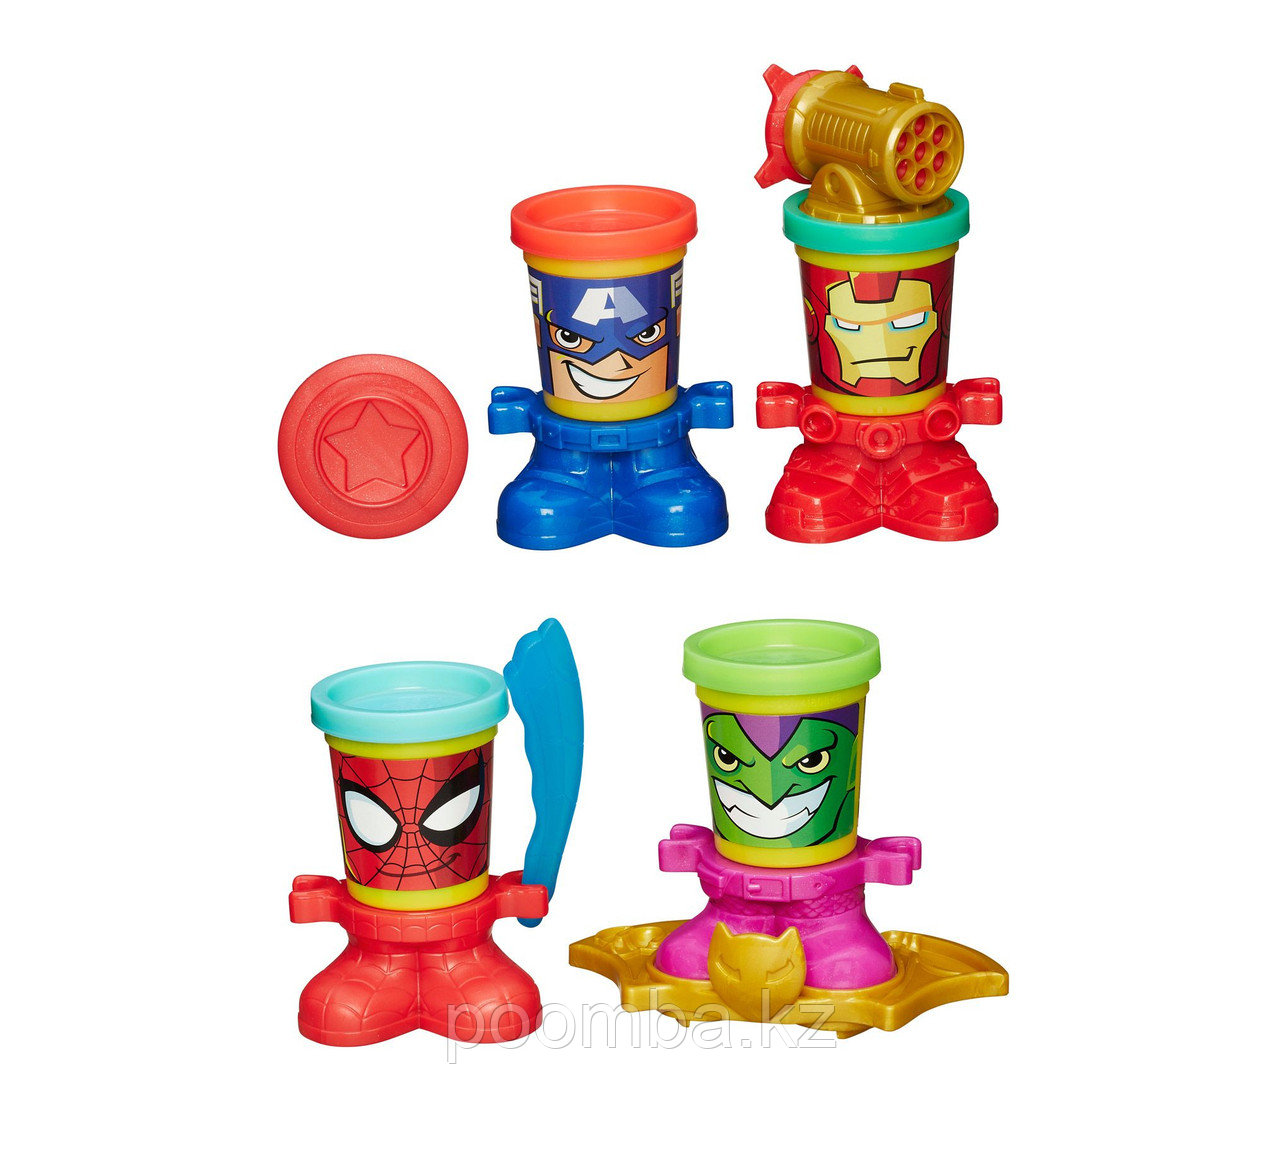 Play-Doh Герои Марвел в асс.